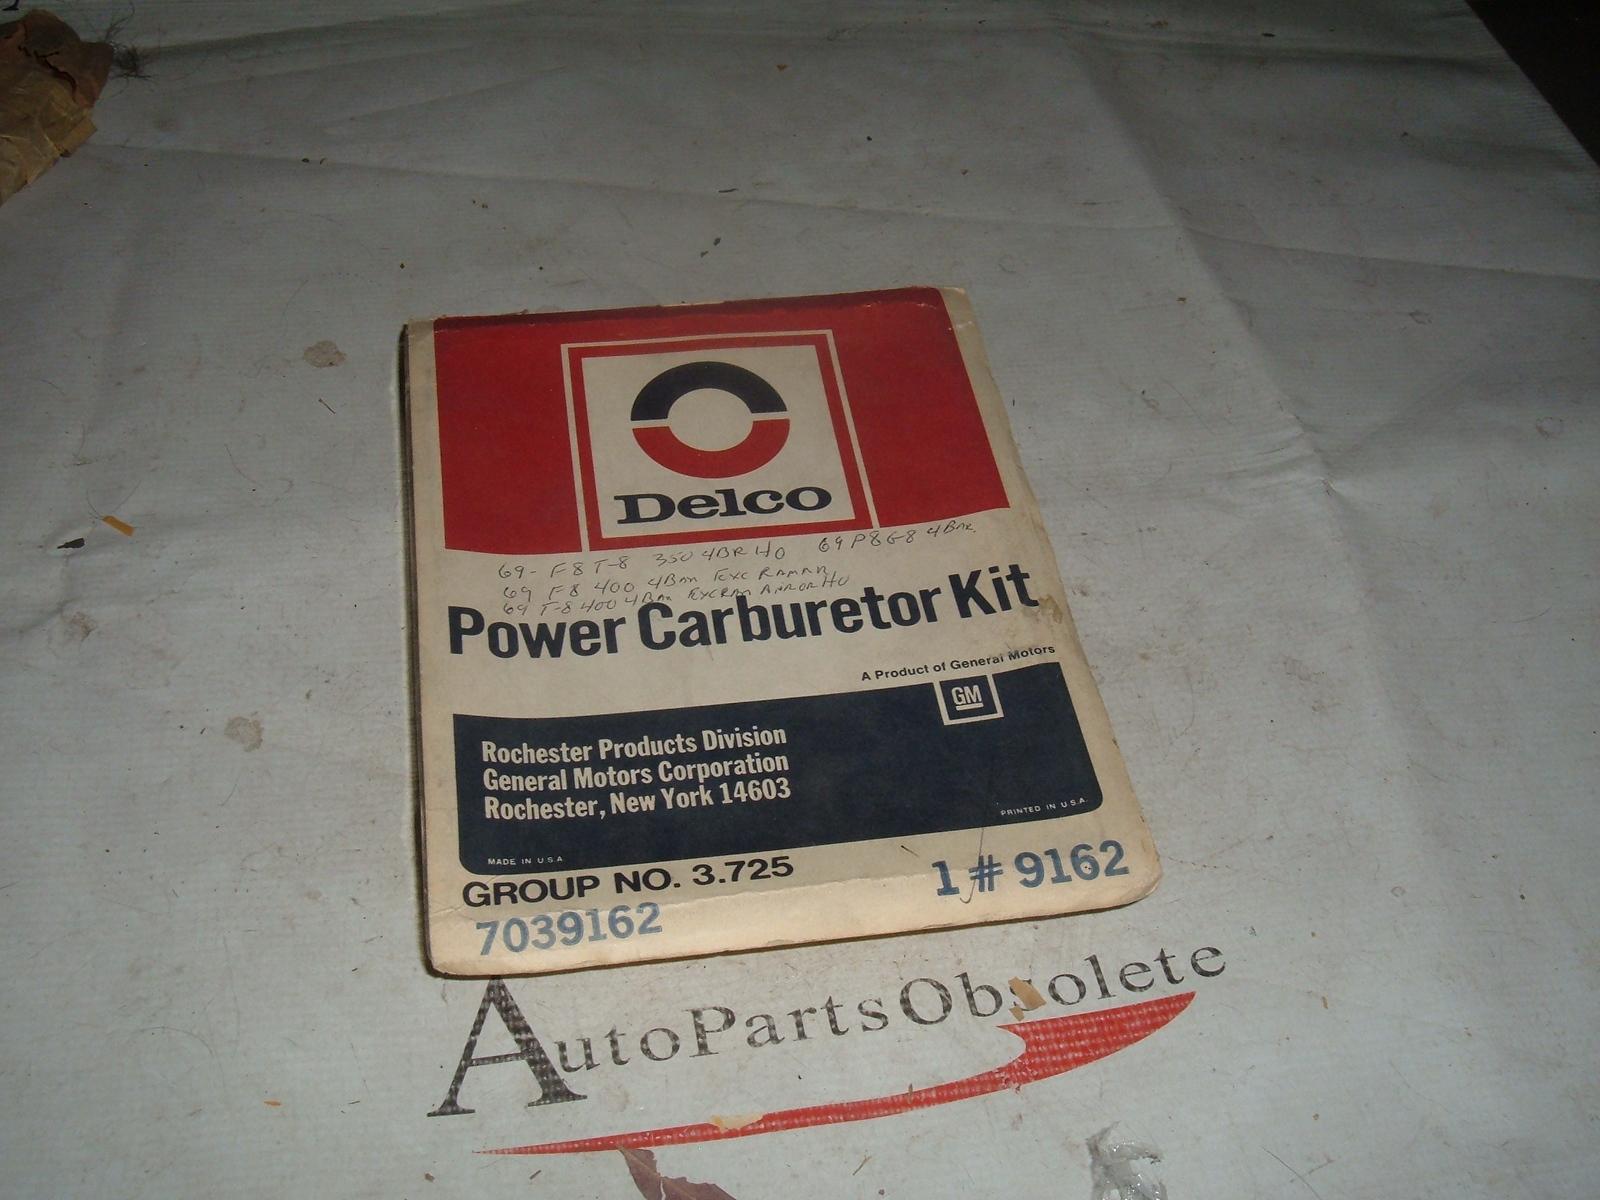 1969 pontiac 4 barrel rochester carburetor rebuild kit nos # 7039162 (z 7039162)